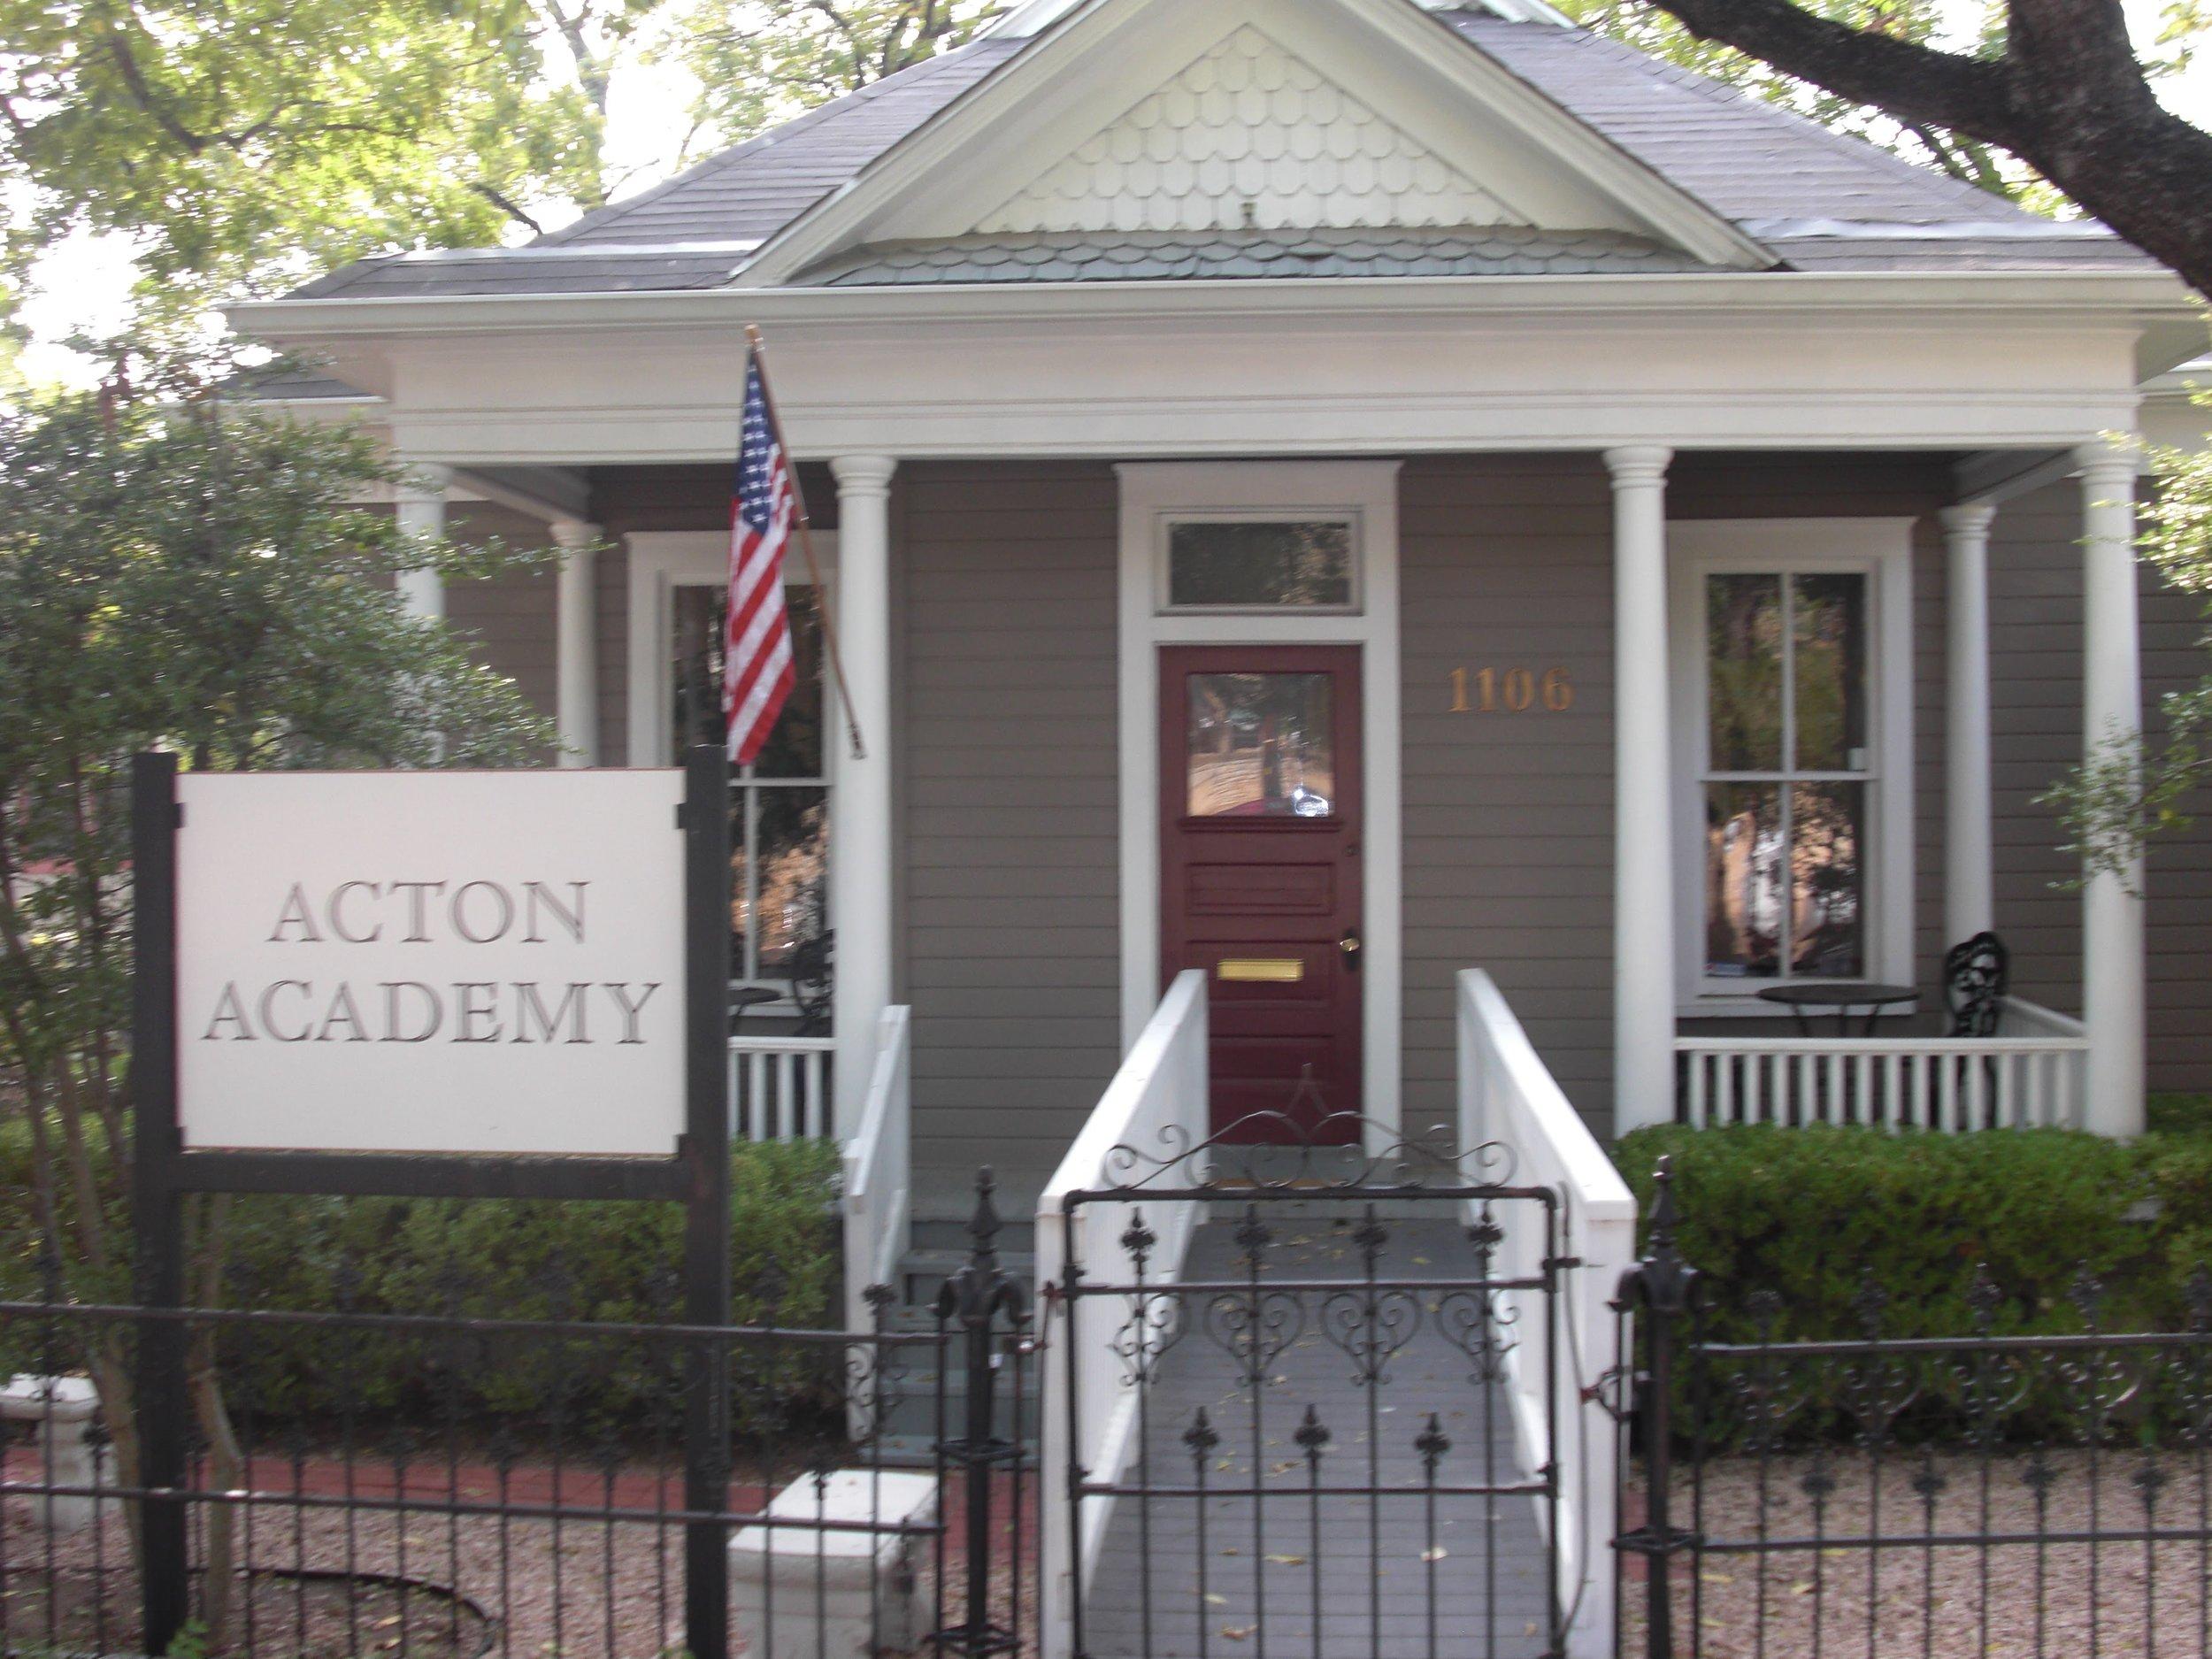 The Original Acton Academy Established in 2009